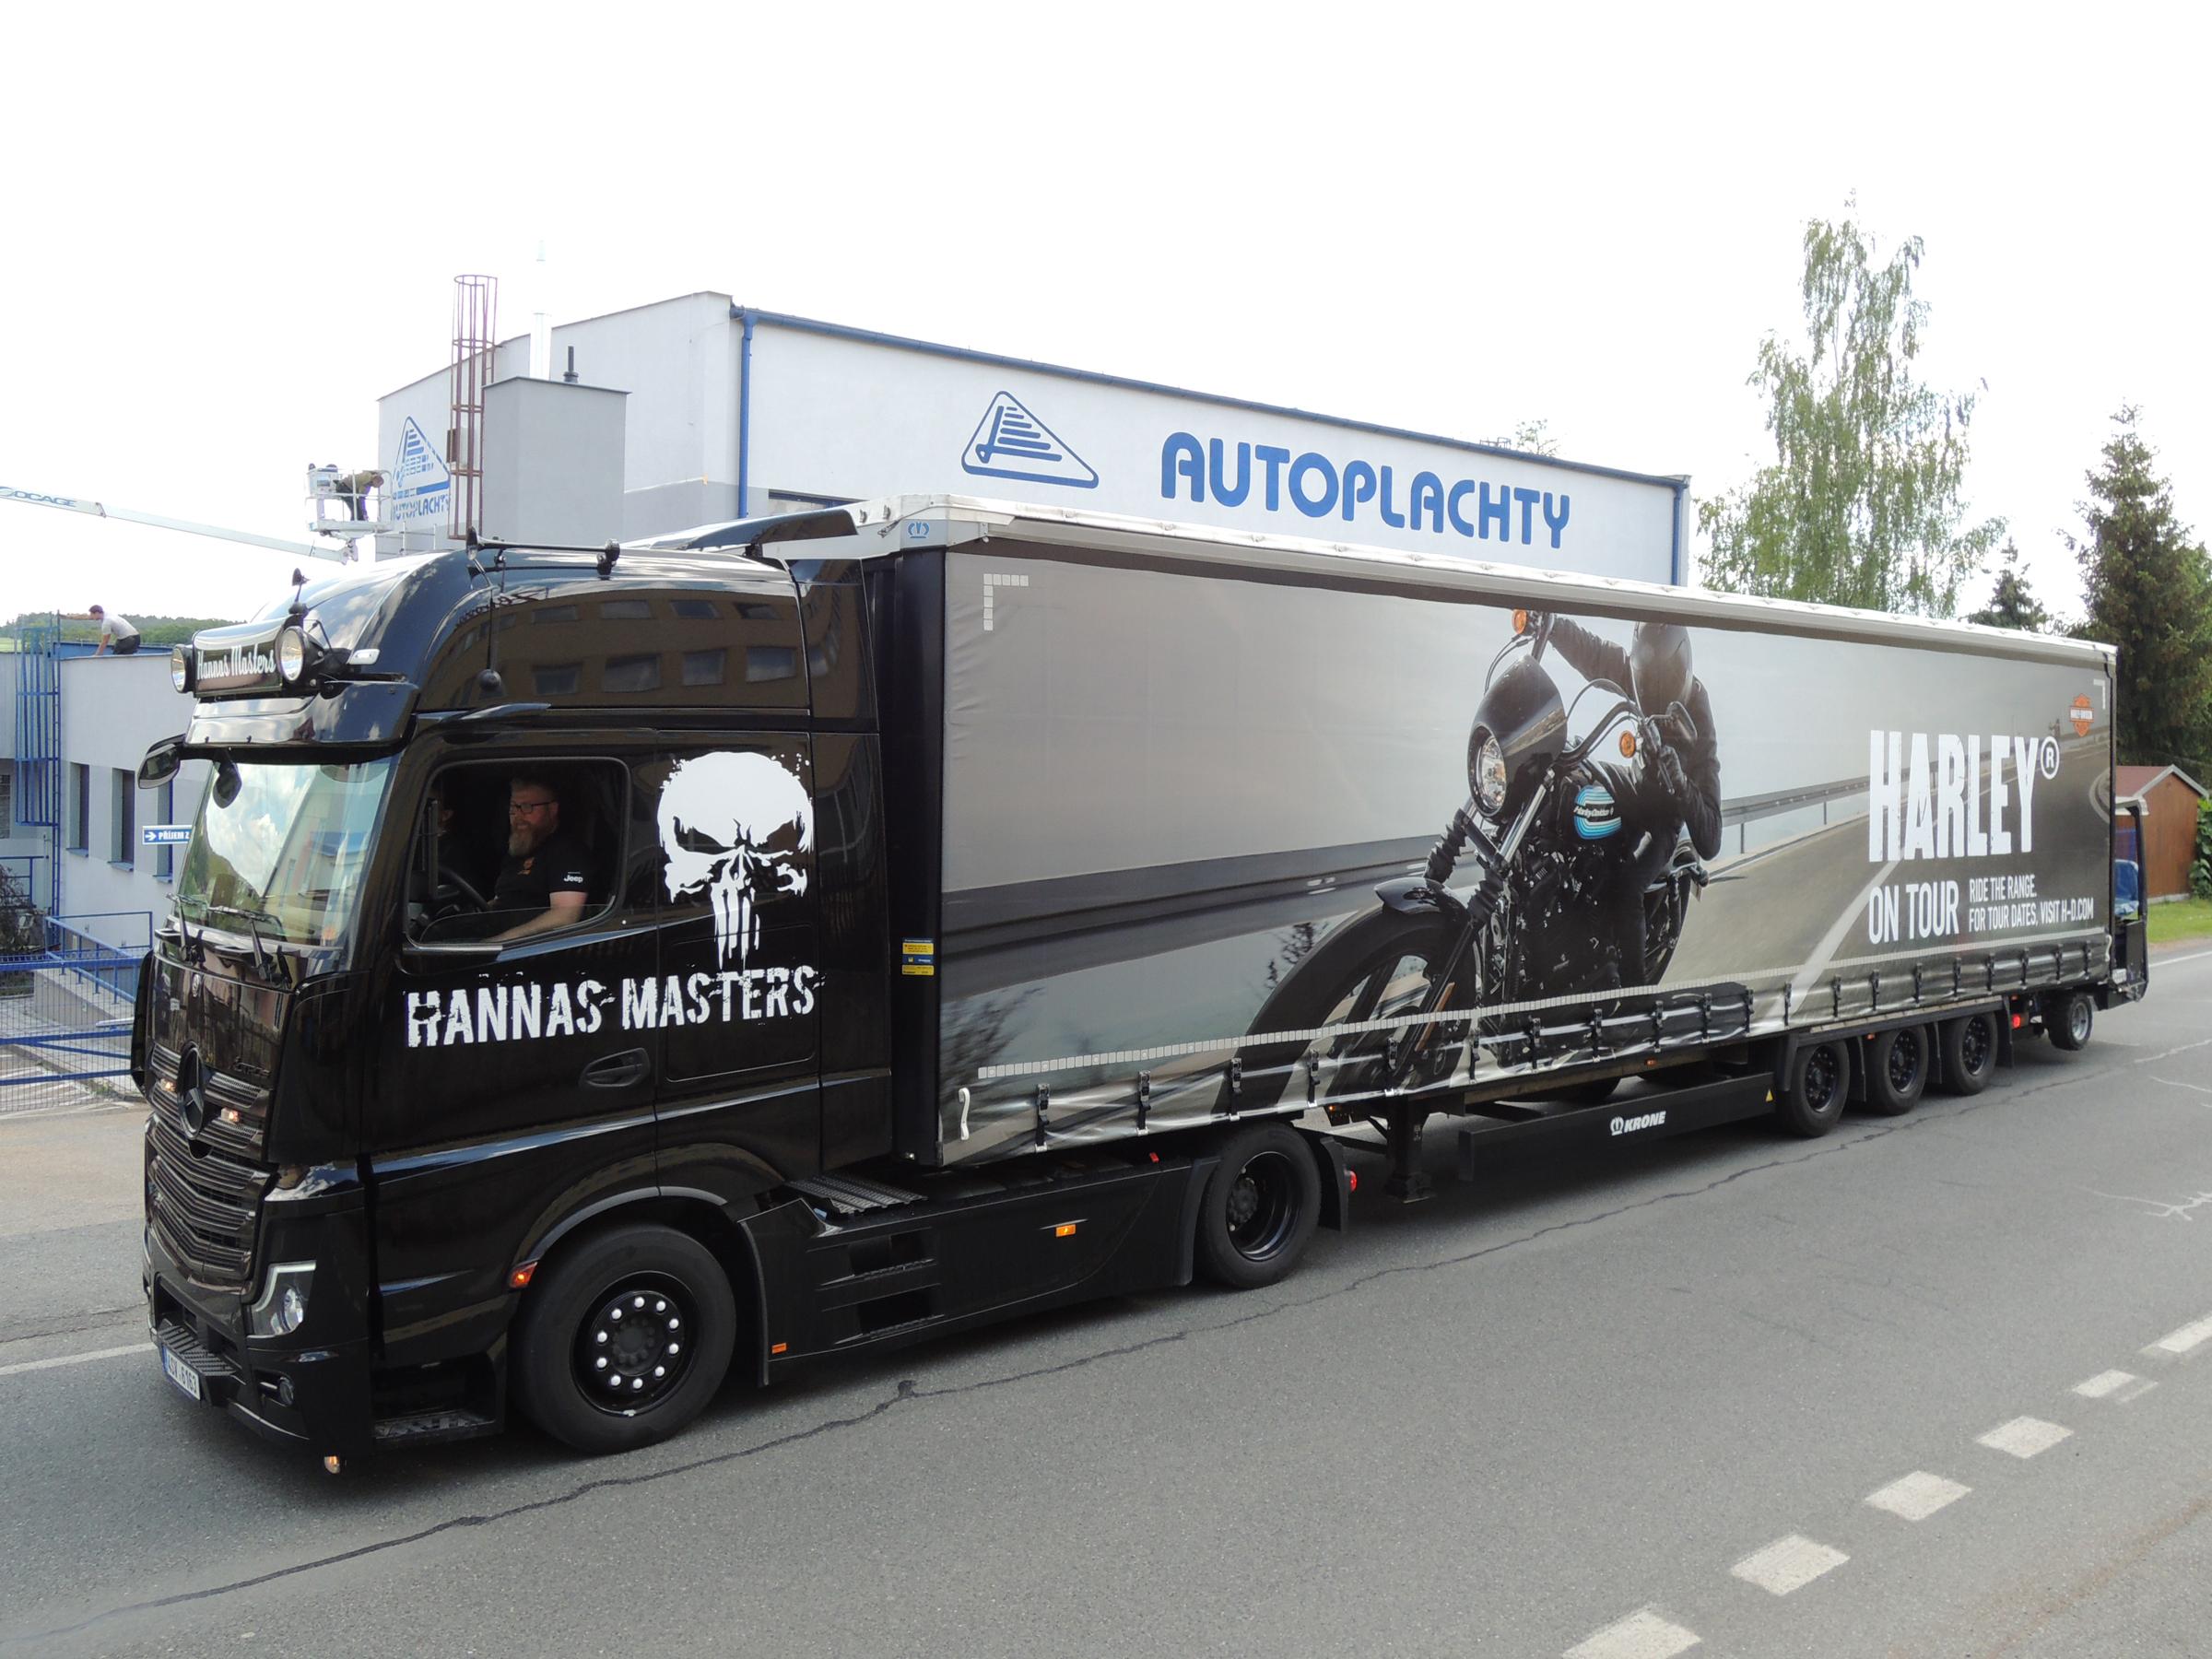 Harley on Tour 2020 truck napakowany motocyklami